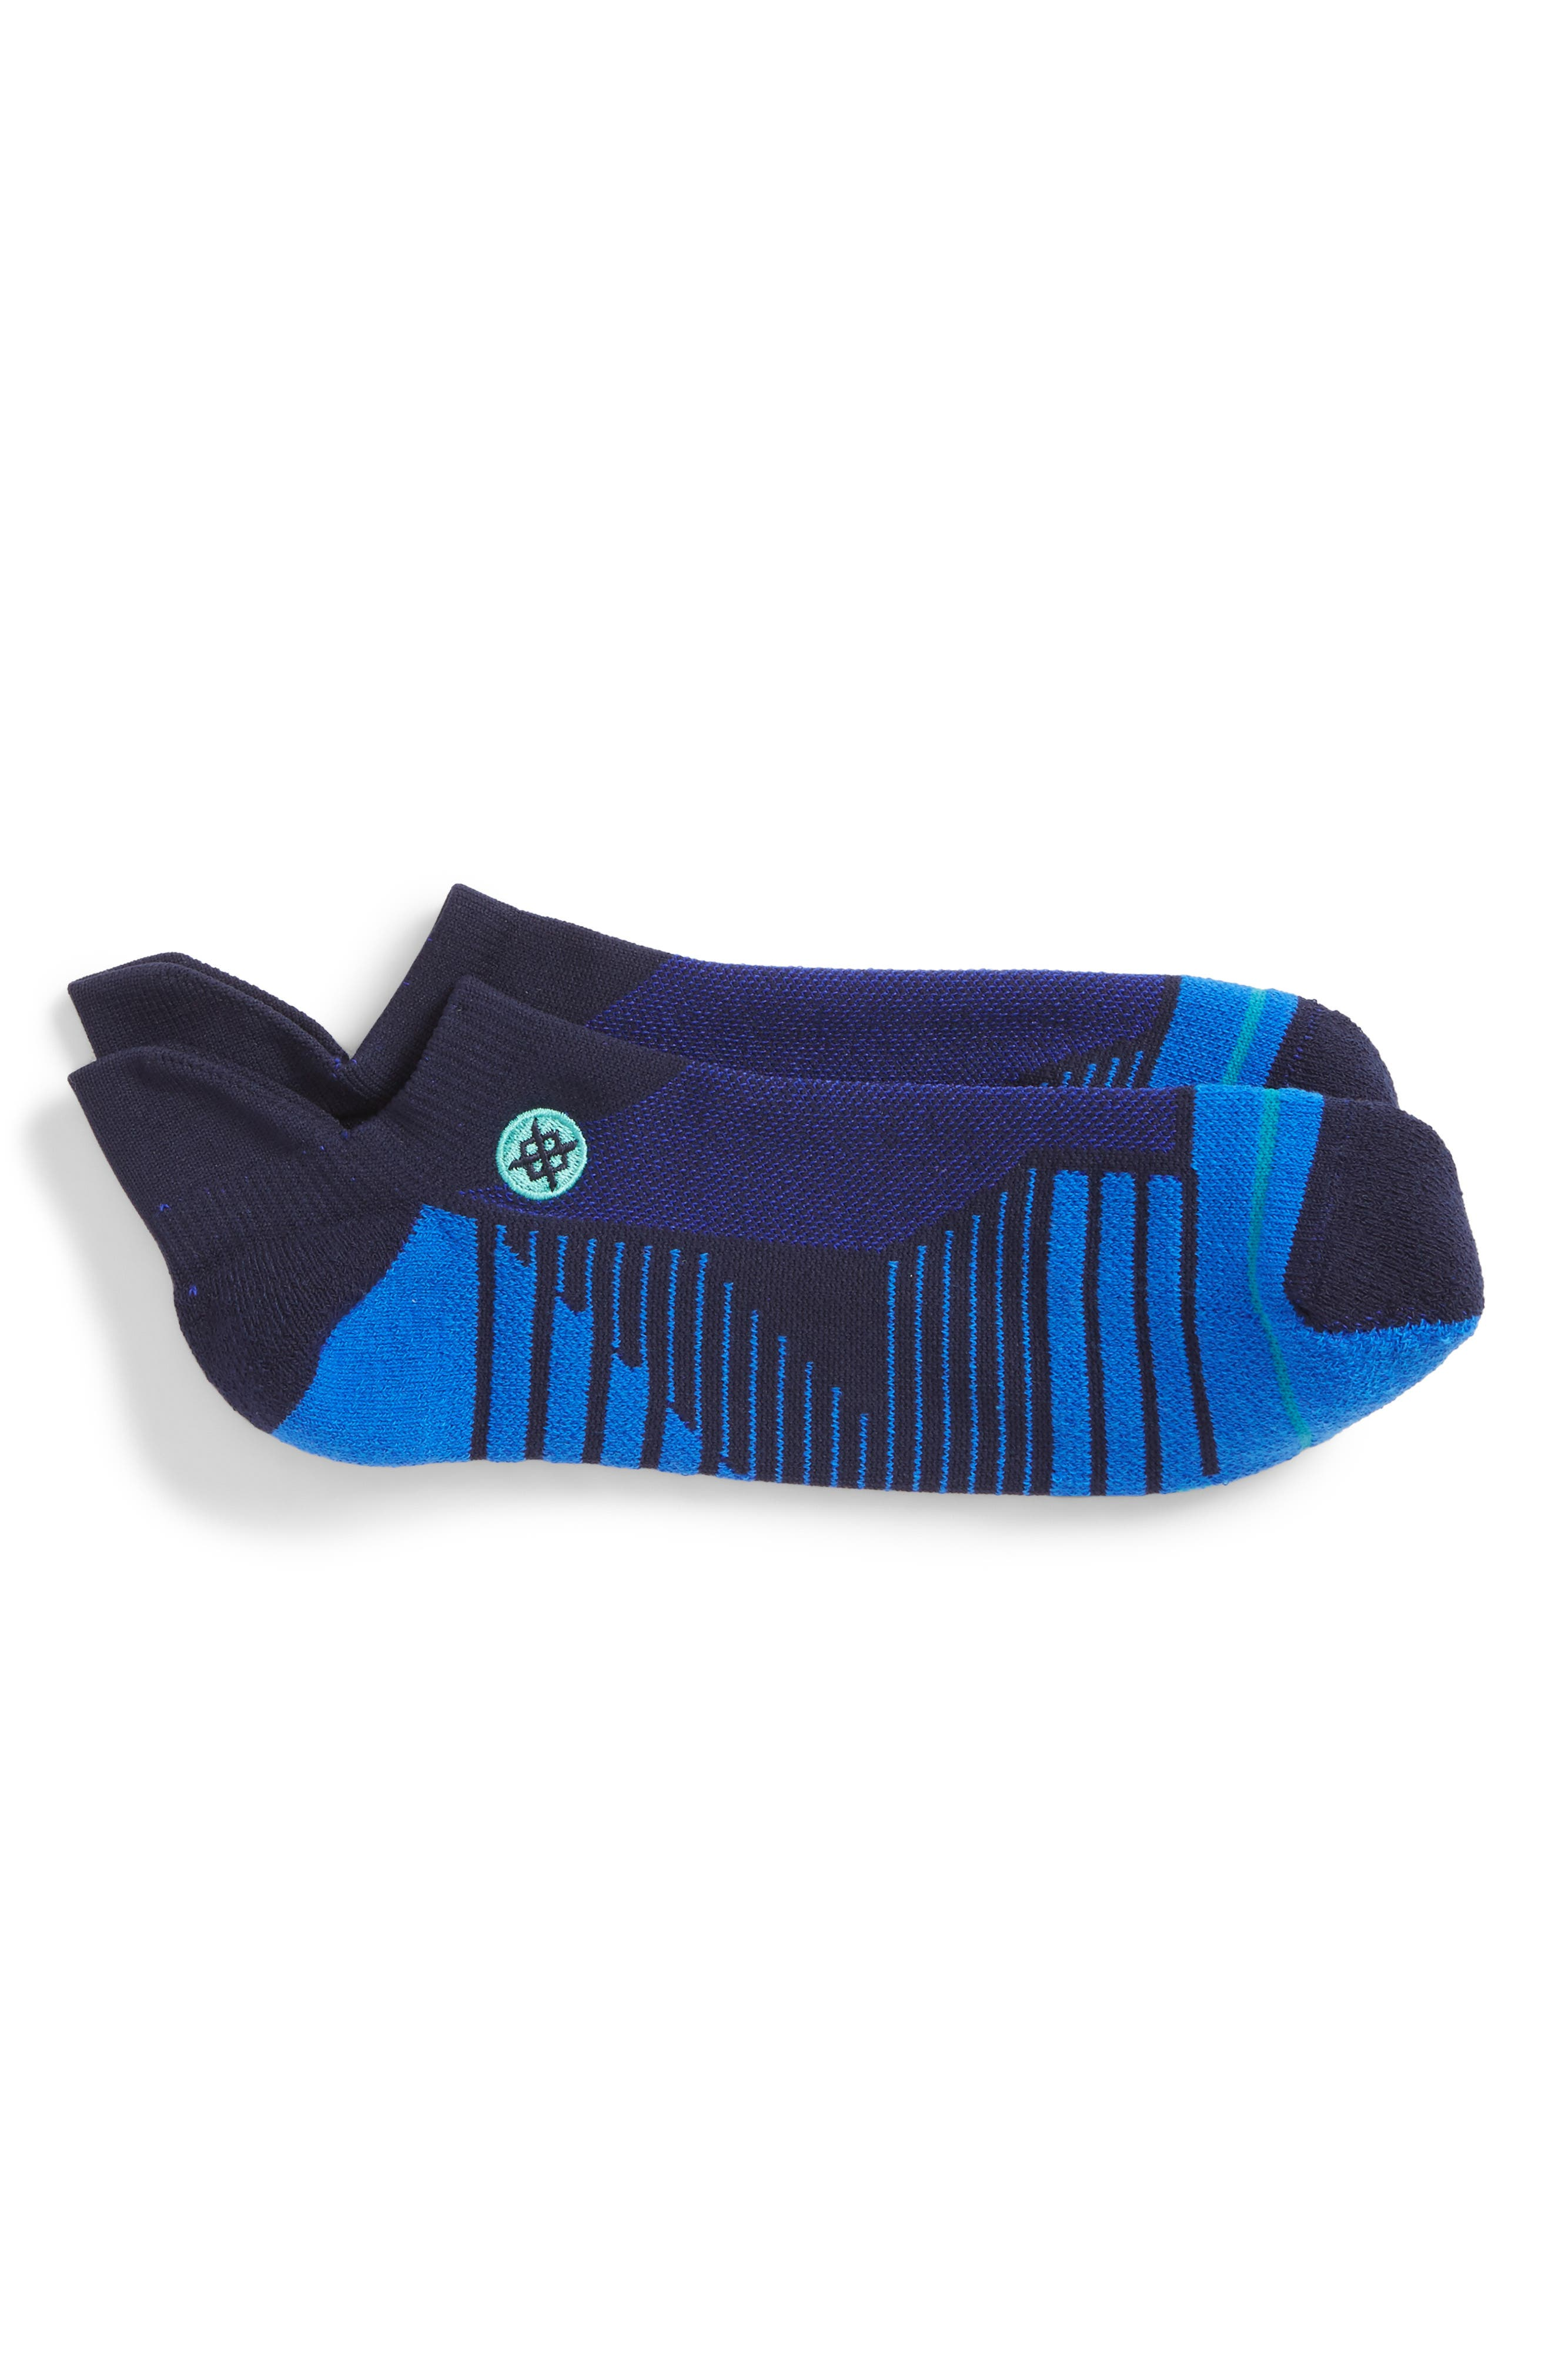 High Regard Tab Socks,                             Main thumbnail 1, color,